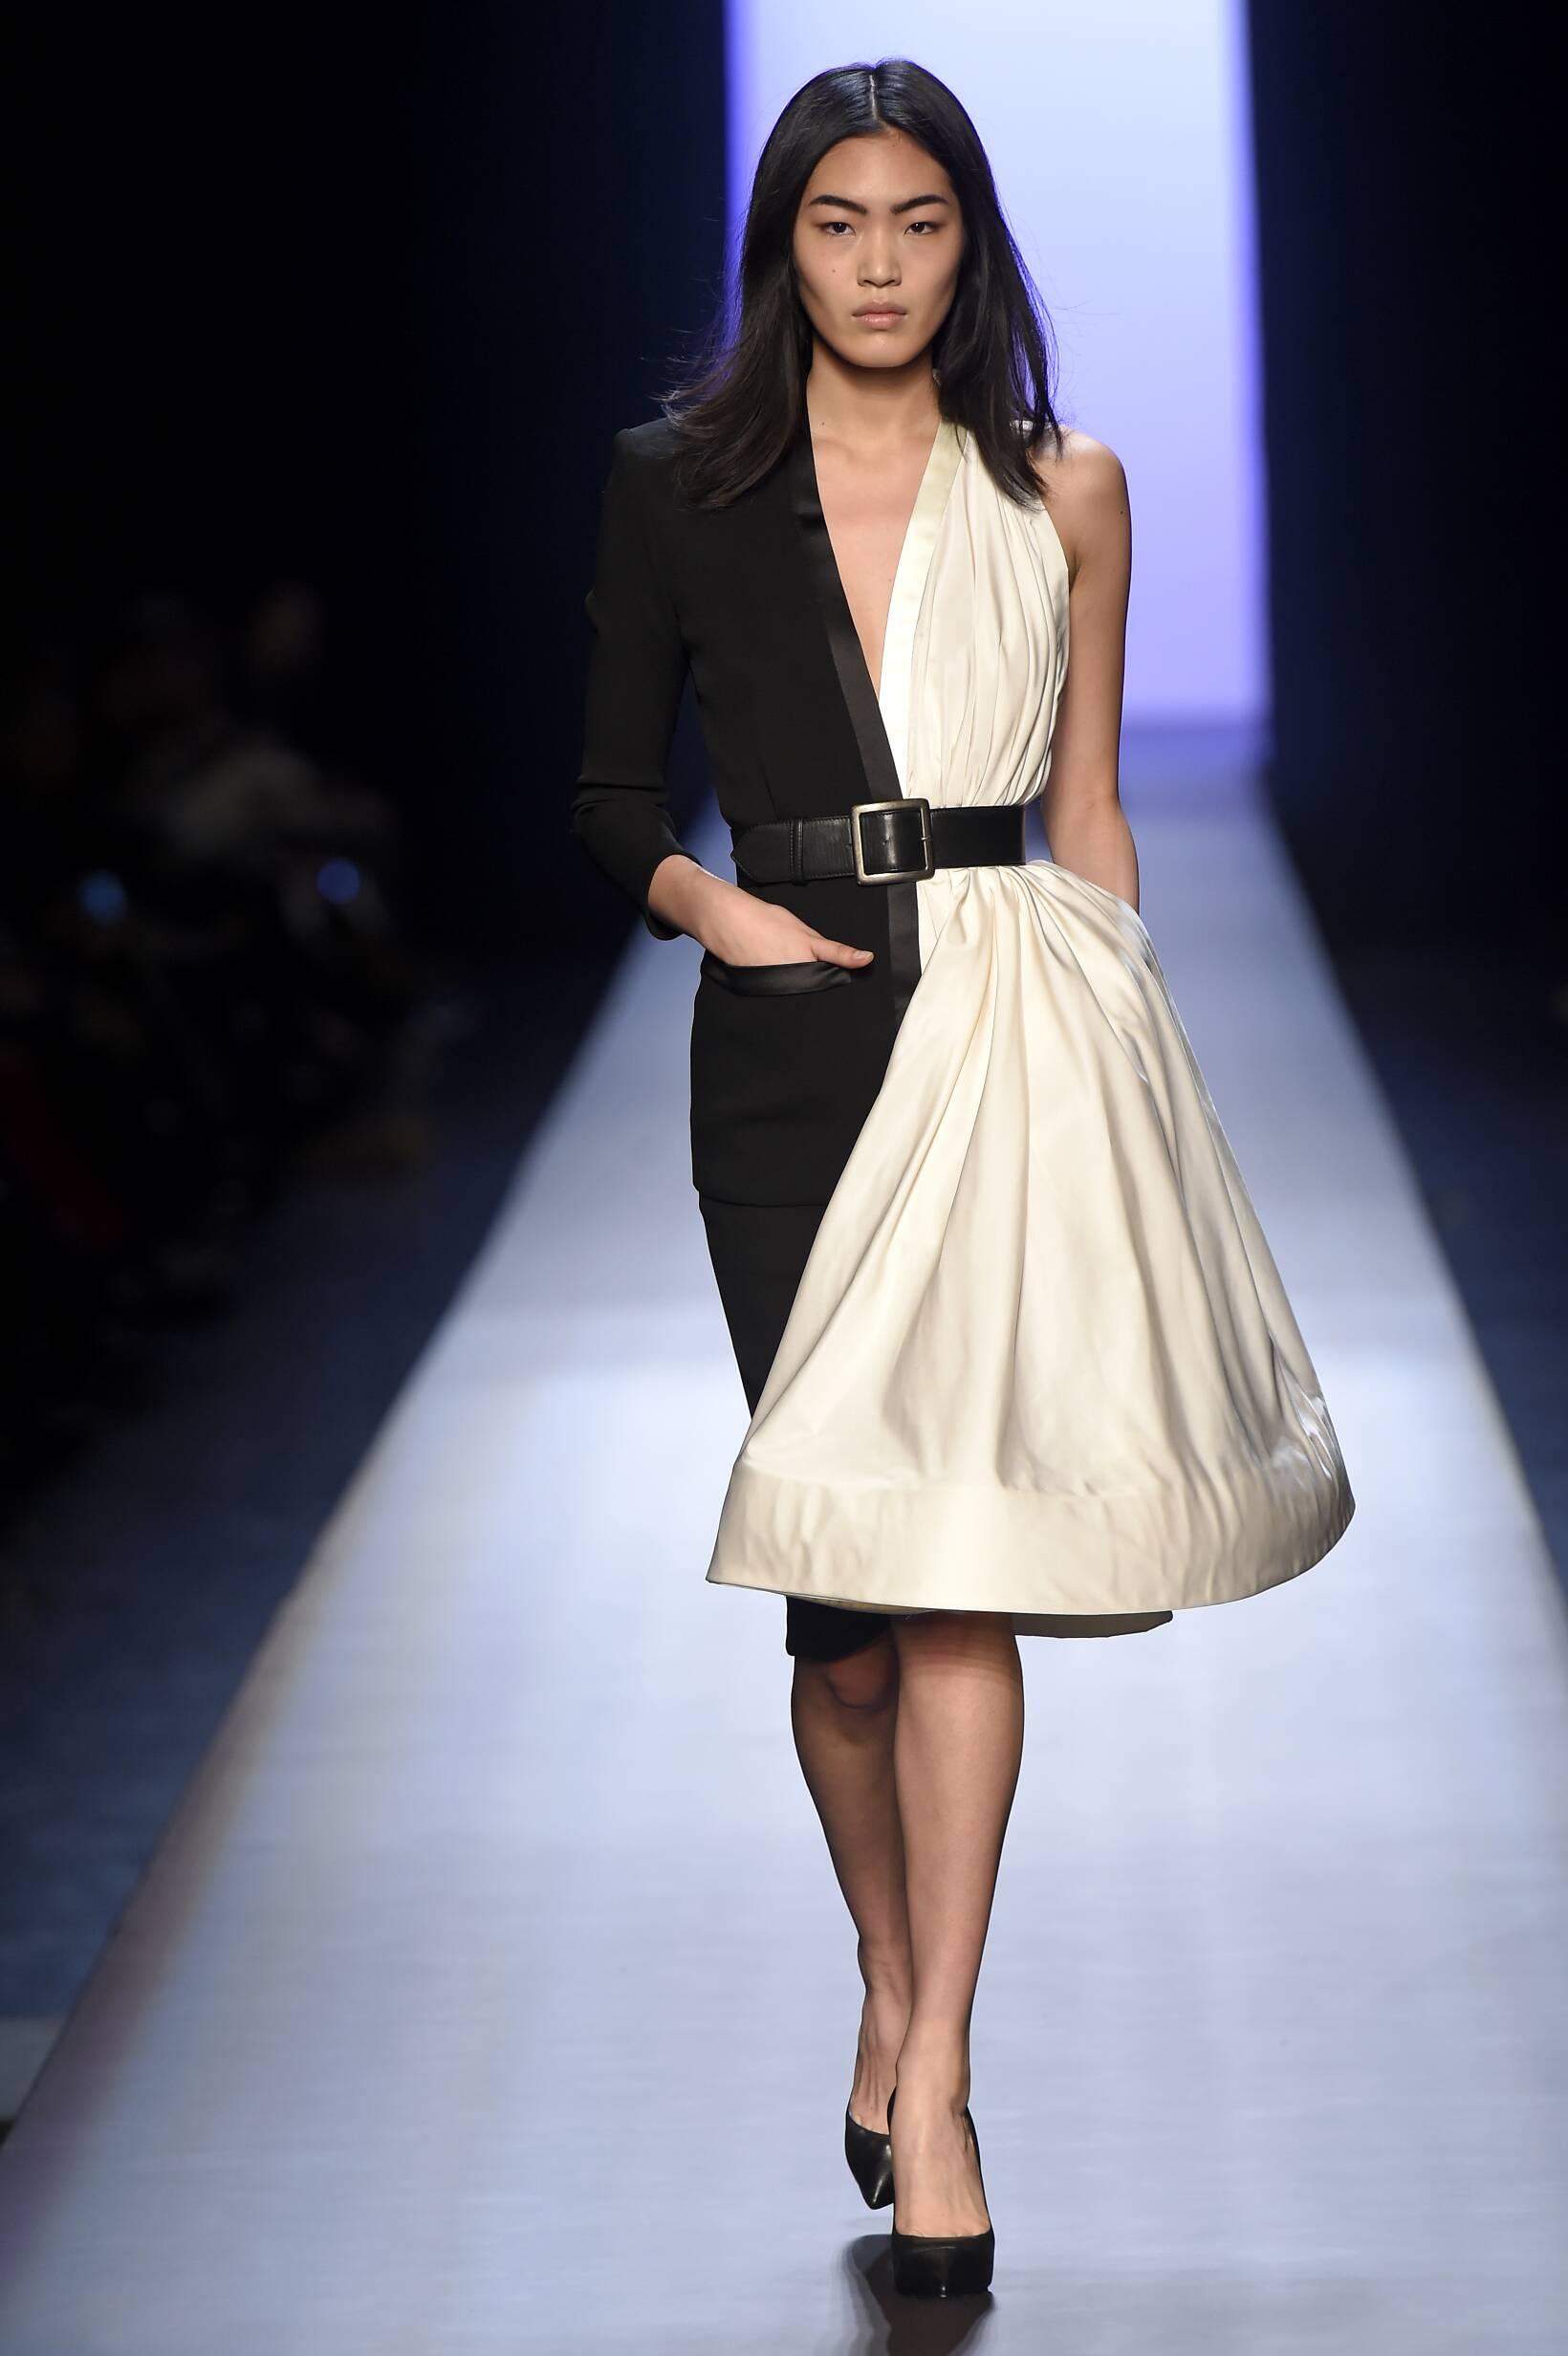 Jean Paul Gaultier Haute Couture Women's Collection 2015